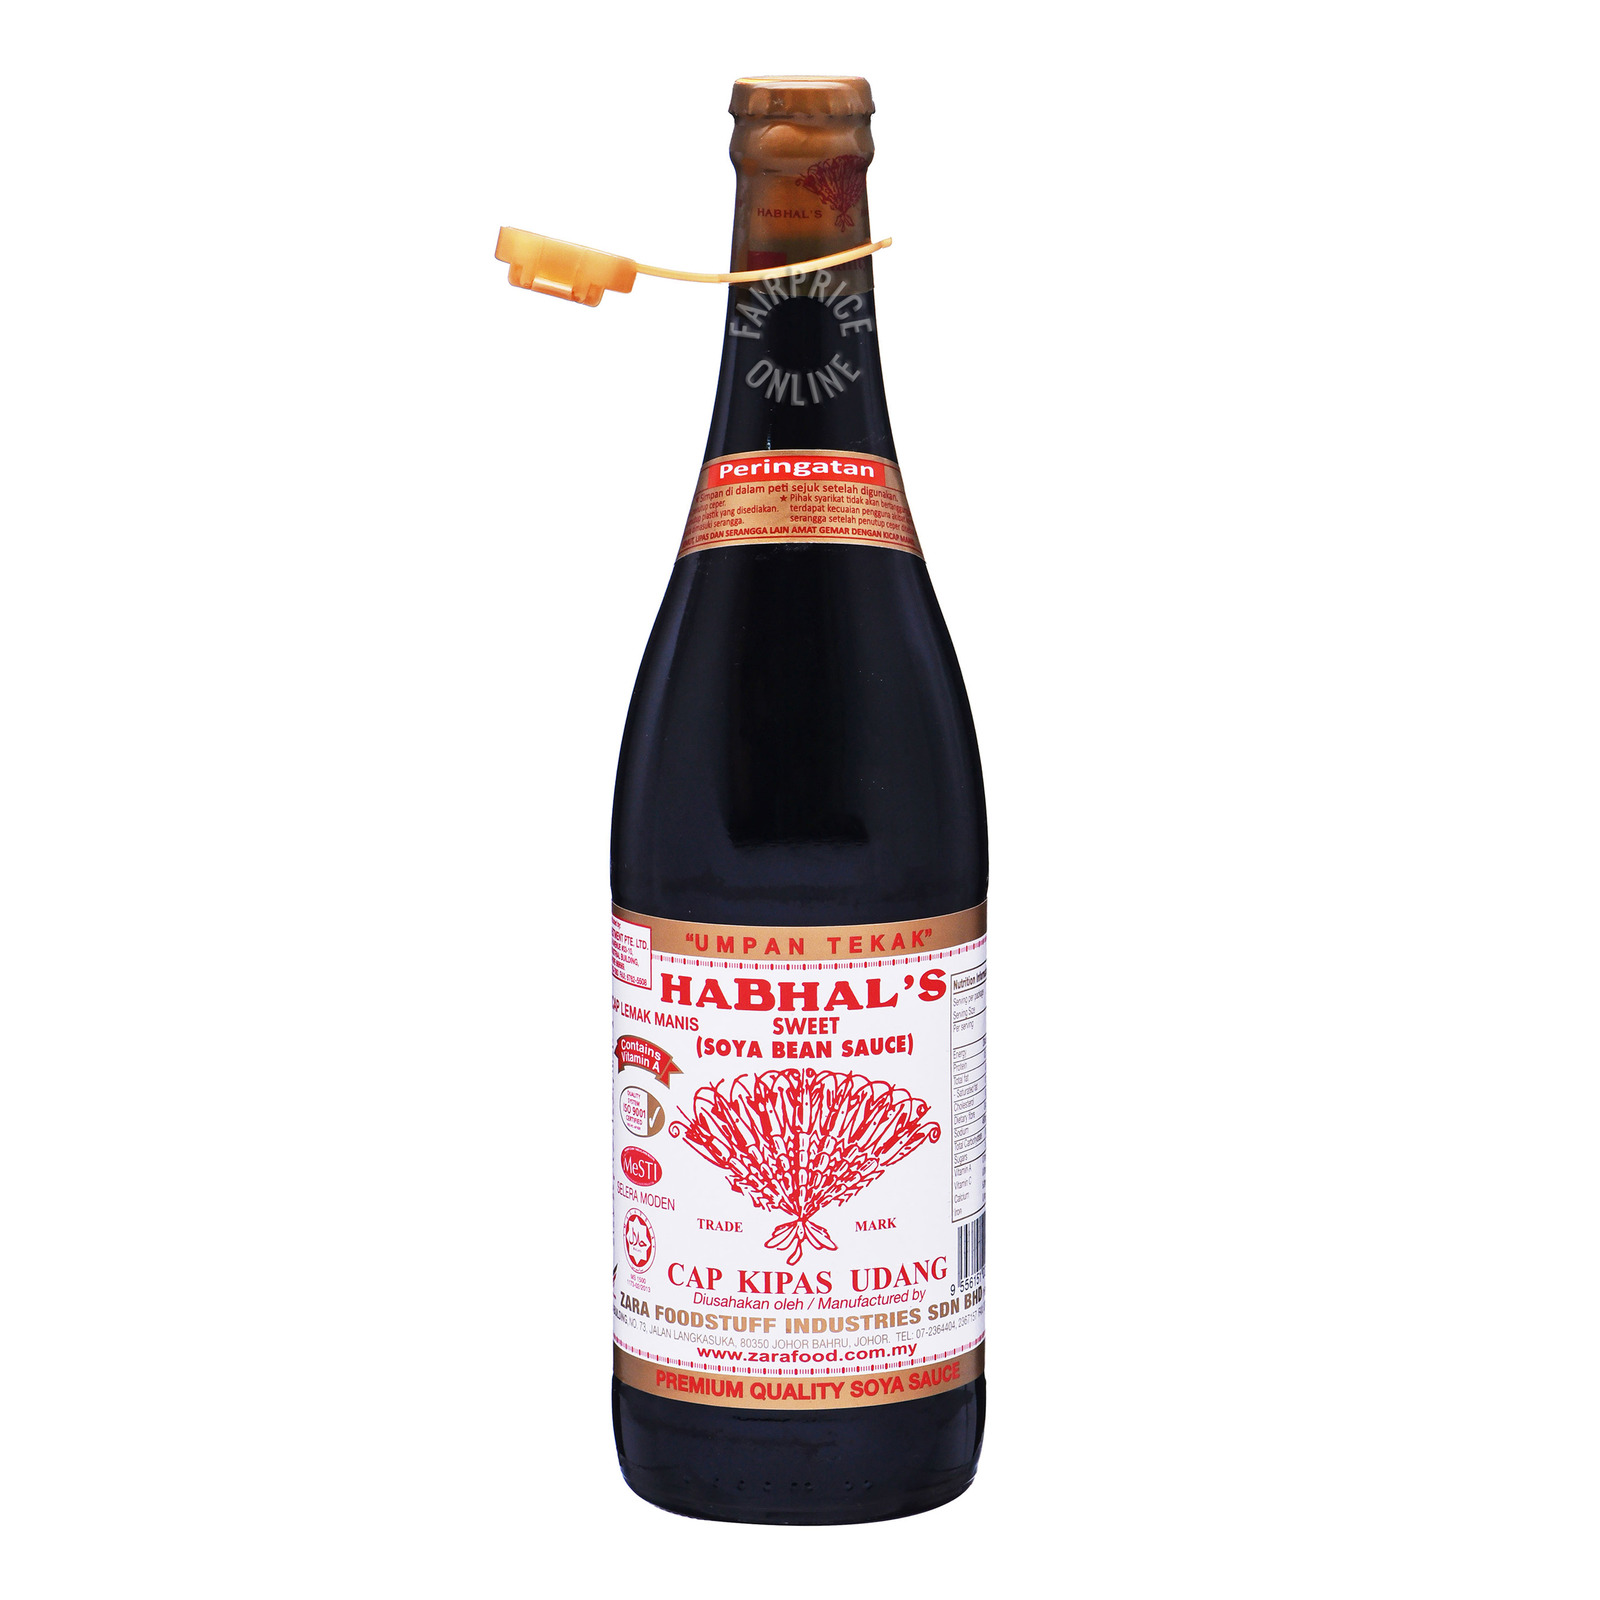 Habhal's Kicap Manis (Soya Bean Sauce) - Sweet